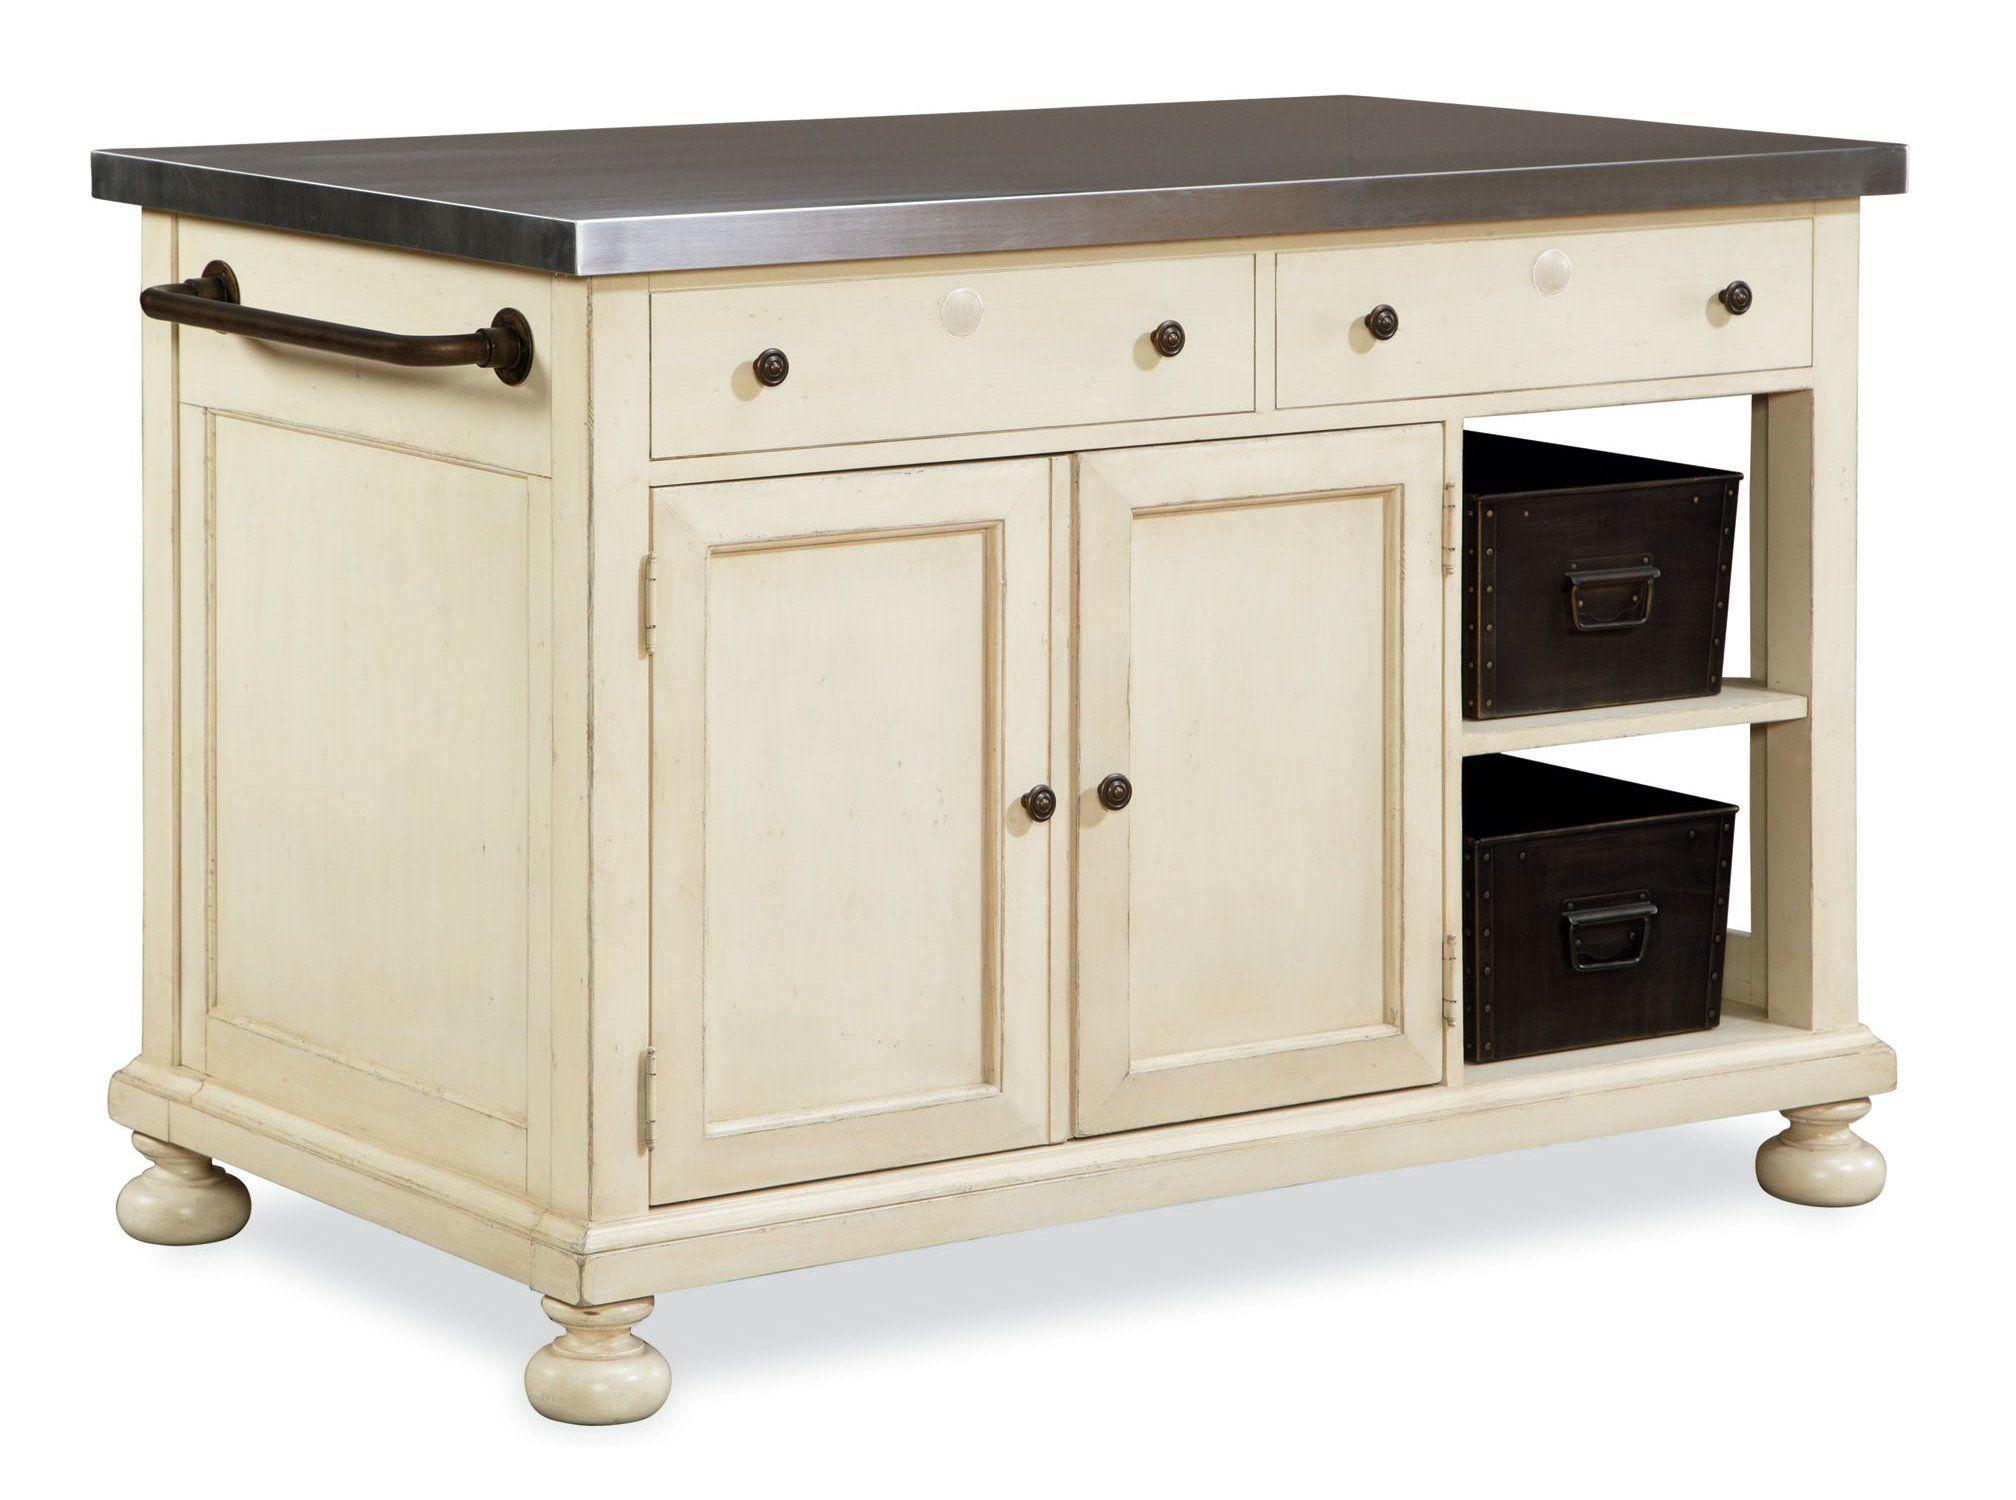 paula deen furniture | Universal Furniture Paula Deen River House ...